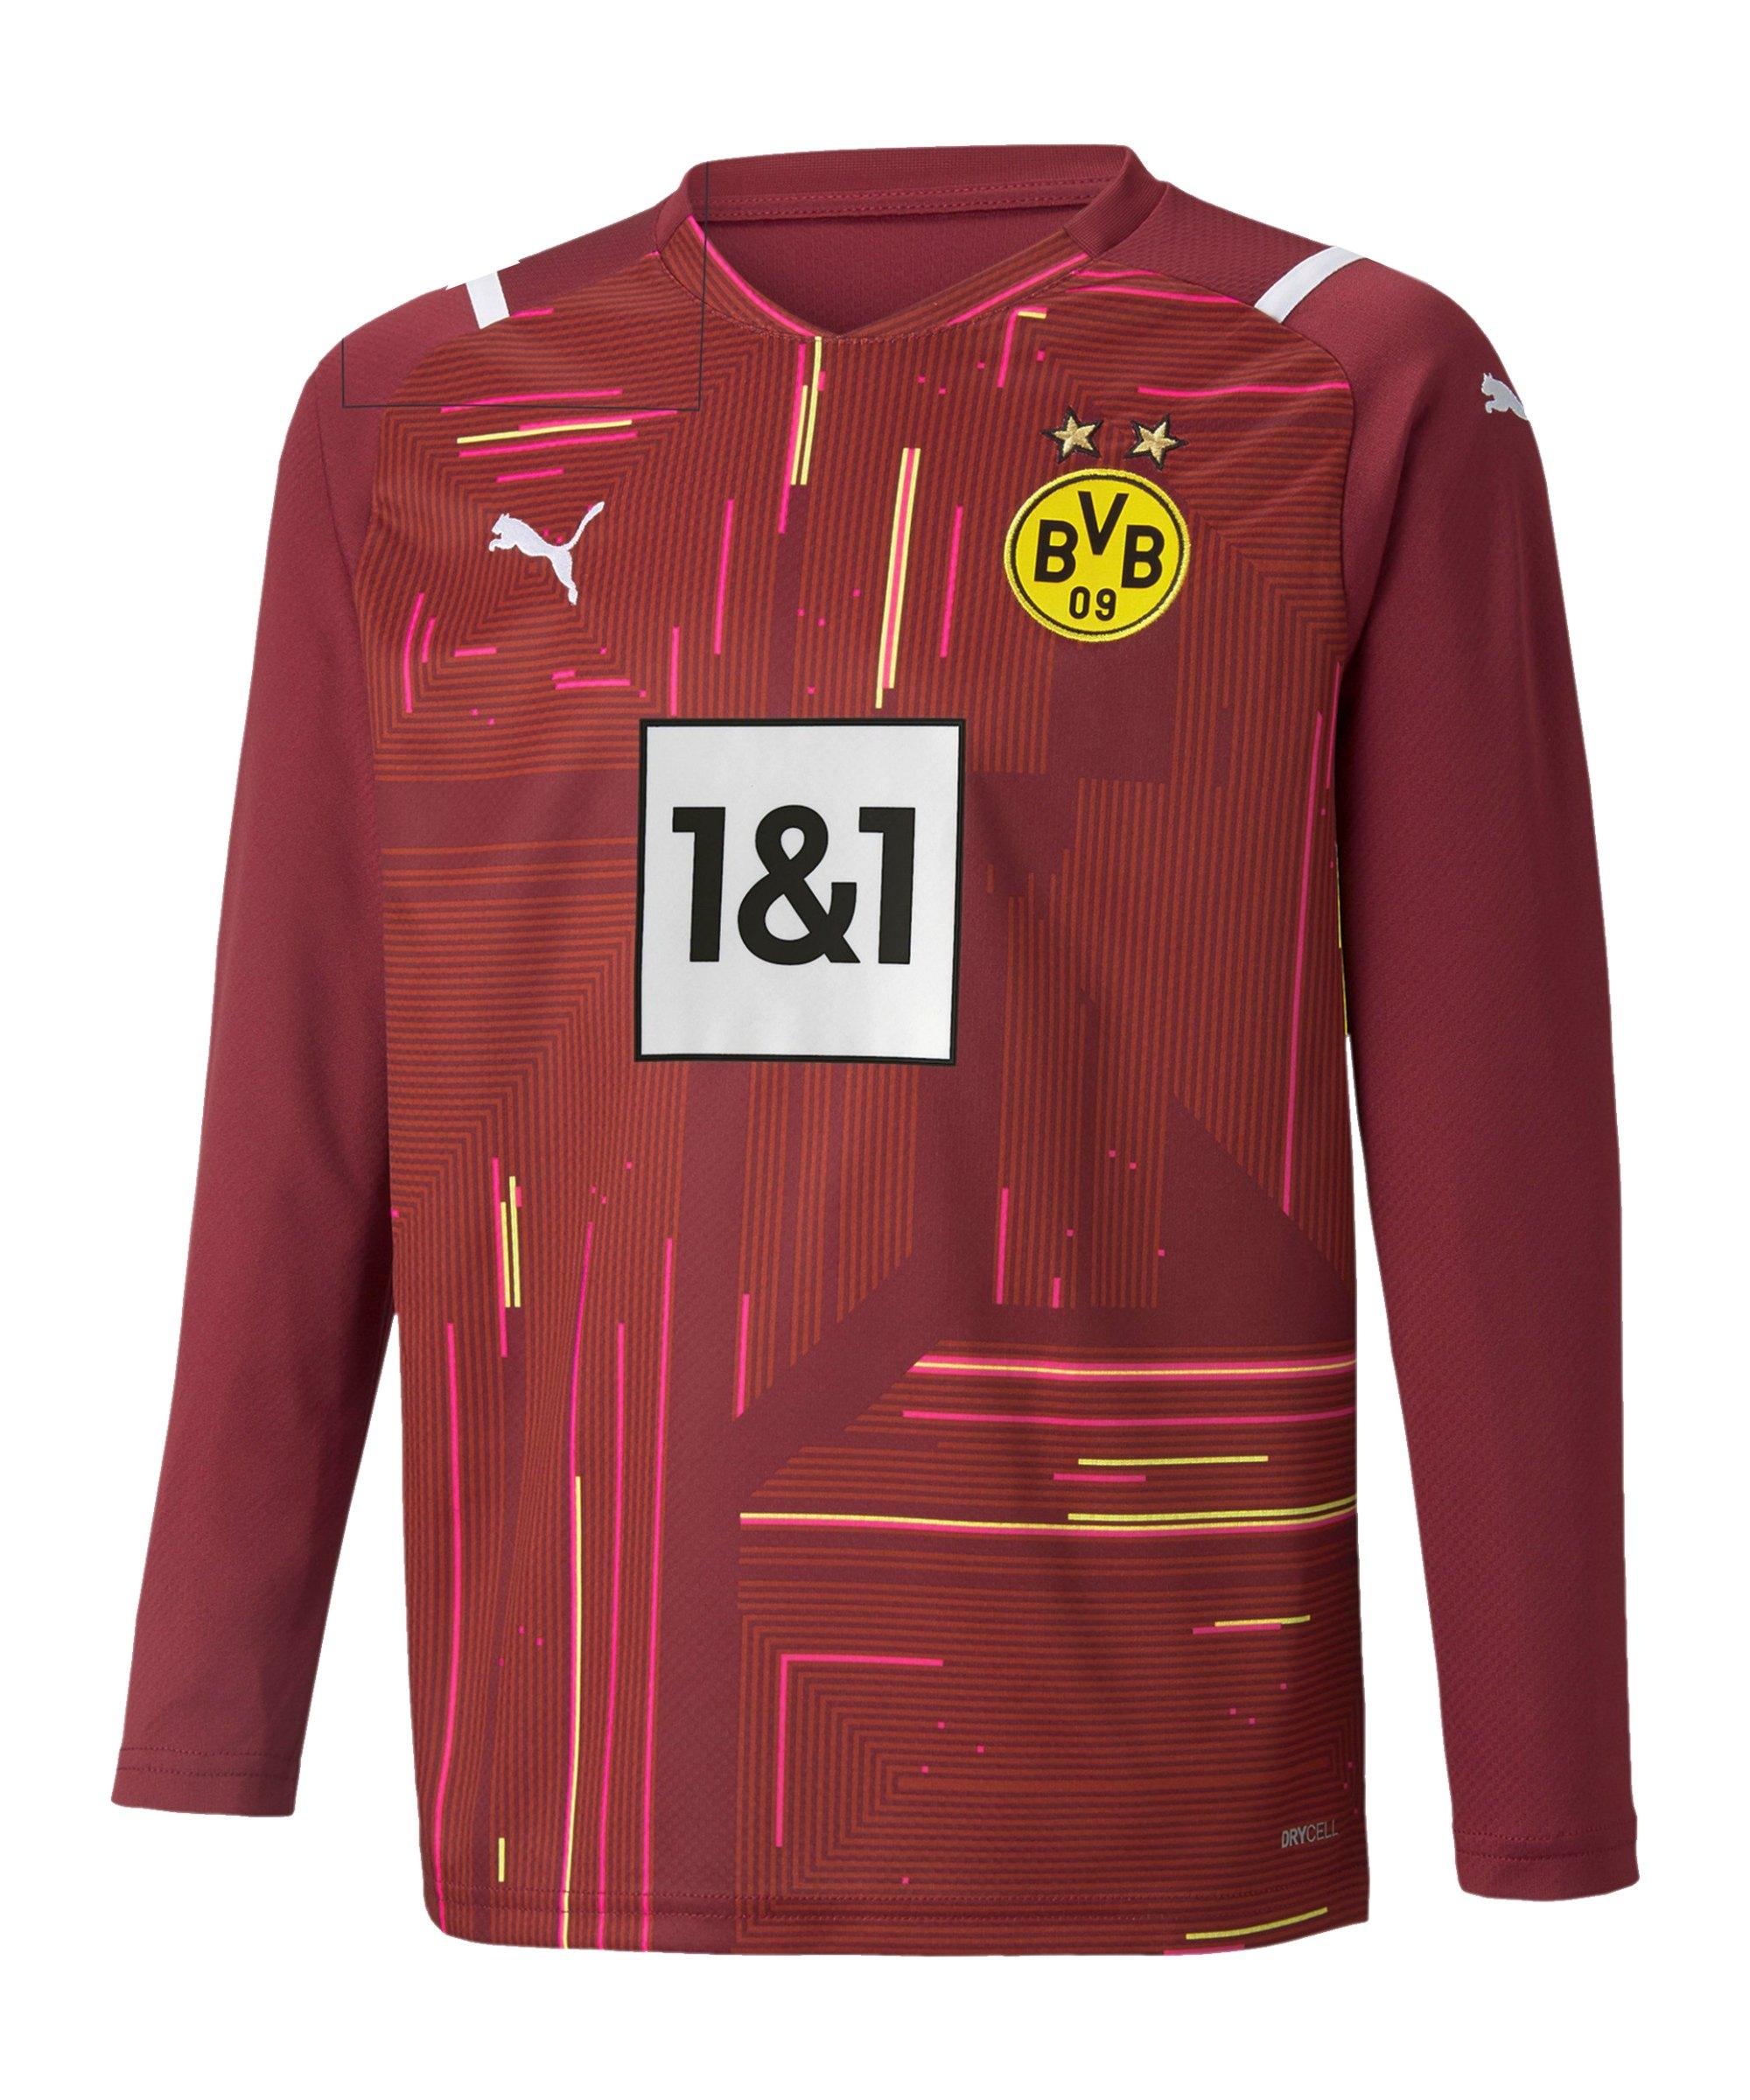 PUMA BVB Dortmund Torwarttrikot 2021/2022 Kids Rot F48 - rot